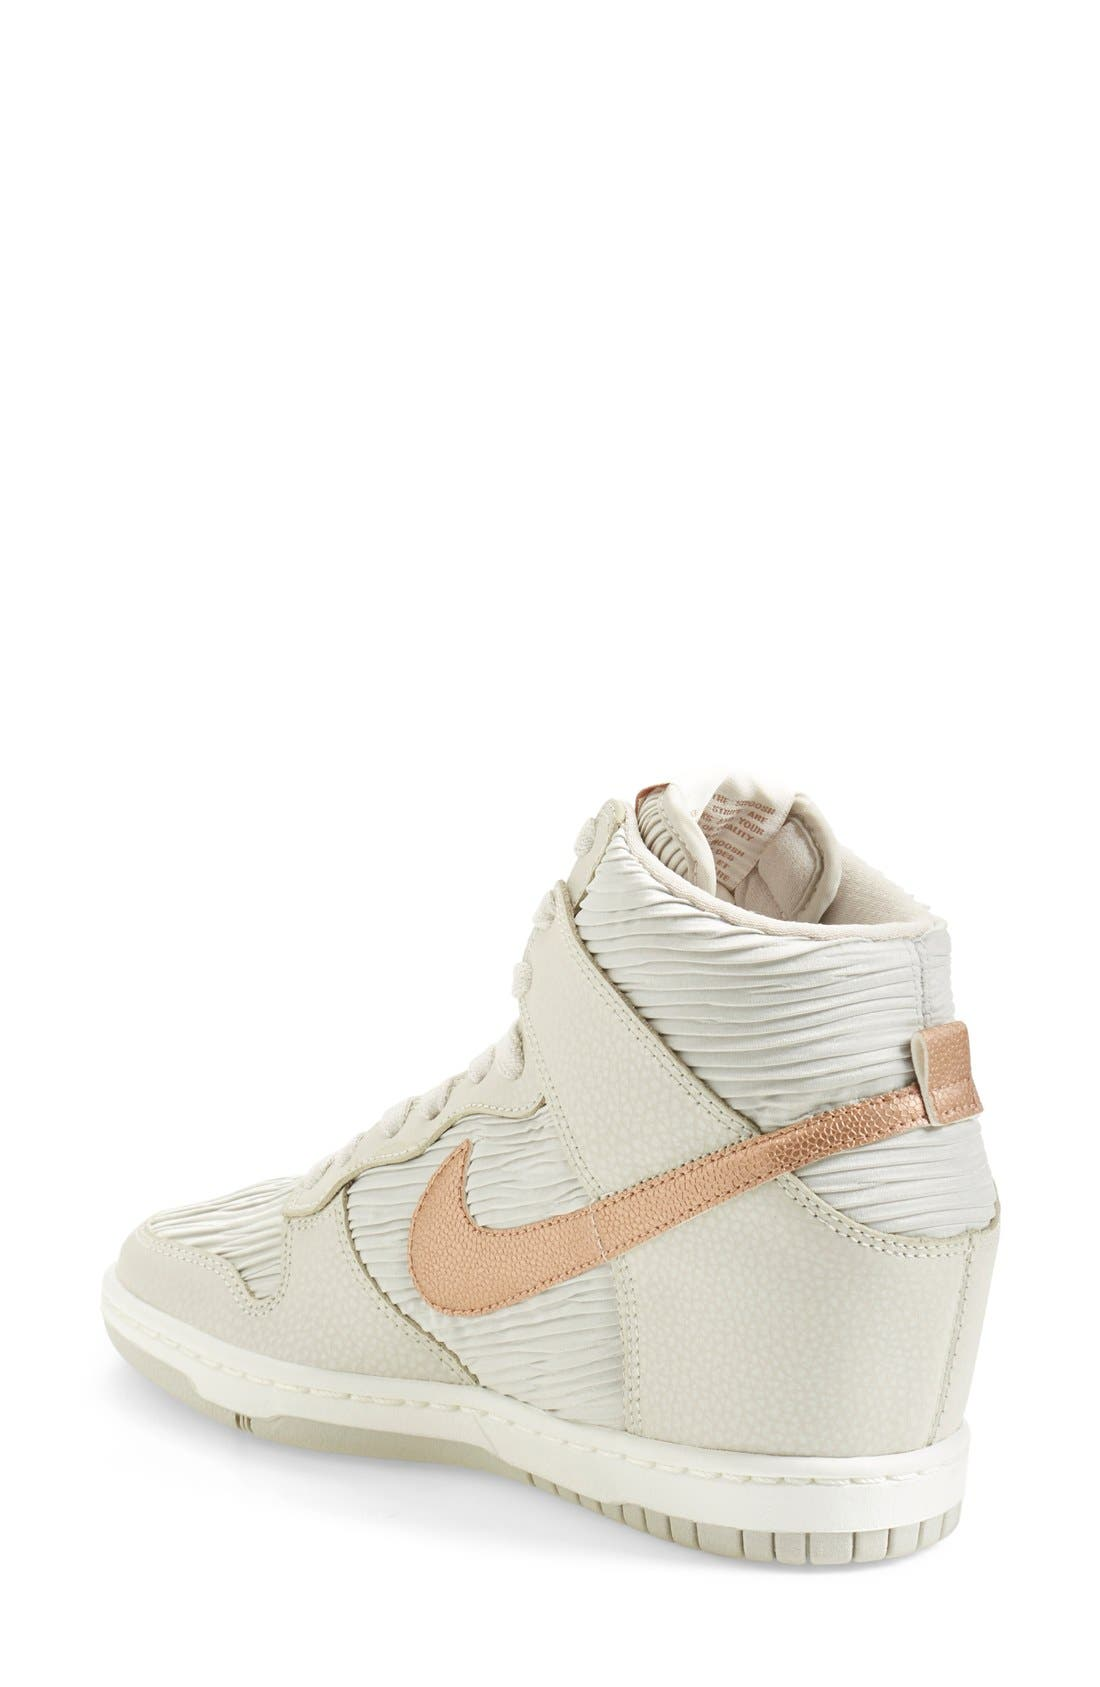 Alternate Image 2  - Nike 'Dunk Sky Hi' Wedge Sneaker (Women)